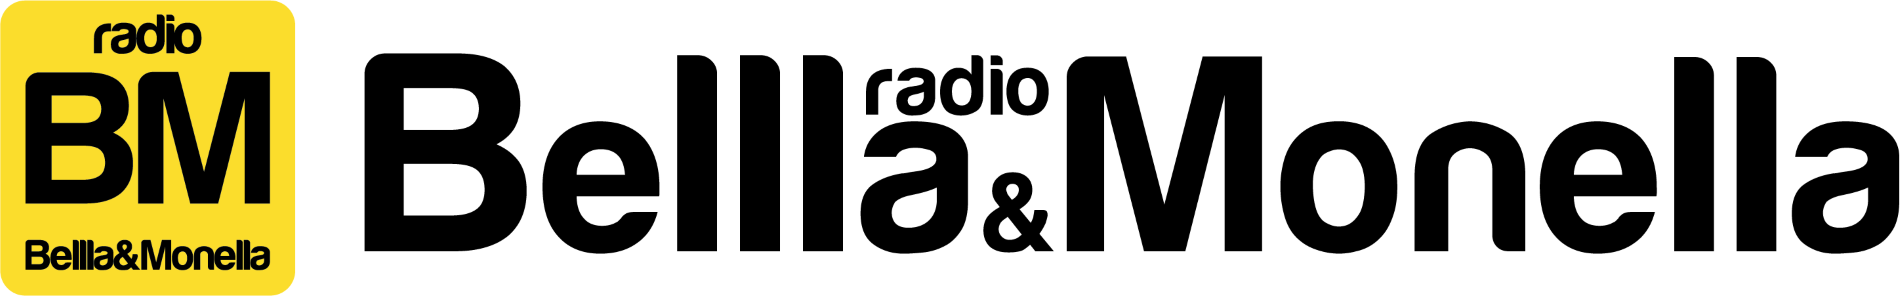 https://tiramisudaytreviso.it/wp-content/uploads/2018/09/RadioBellaMonella.png